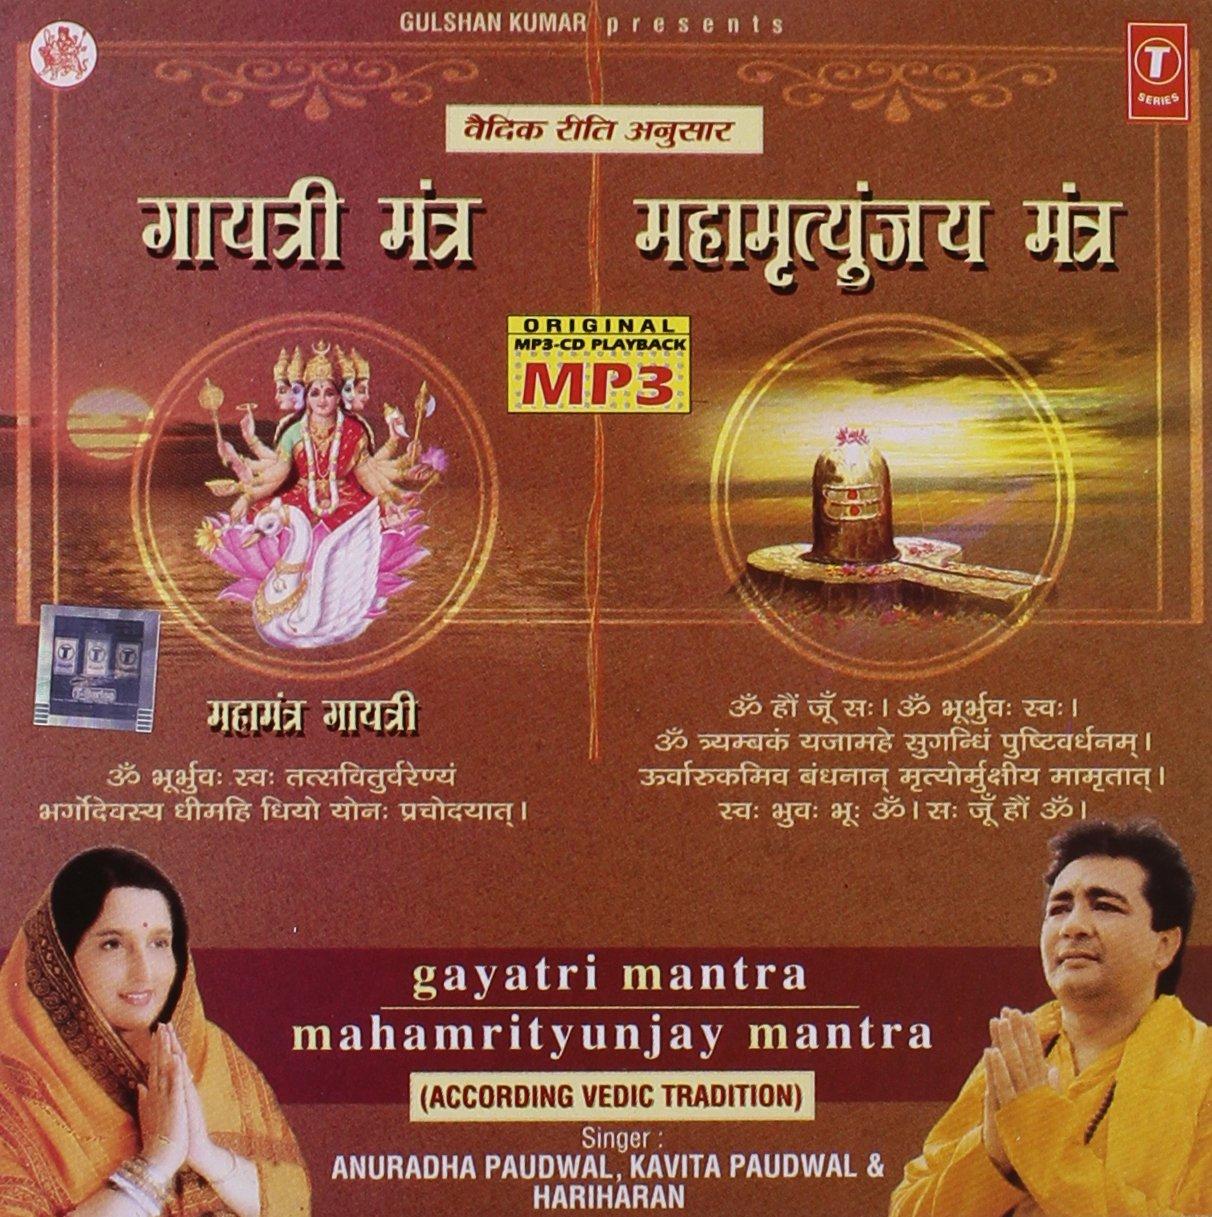 Vedic mantra hd wallpaper full size download.